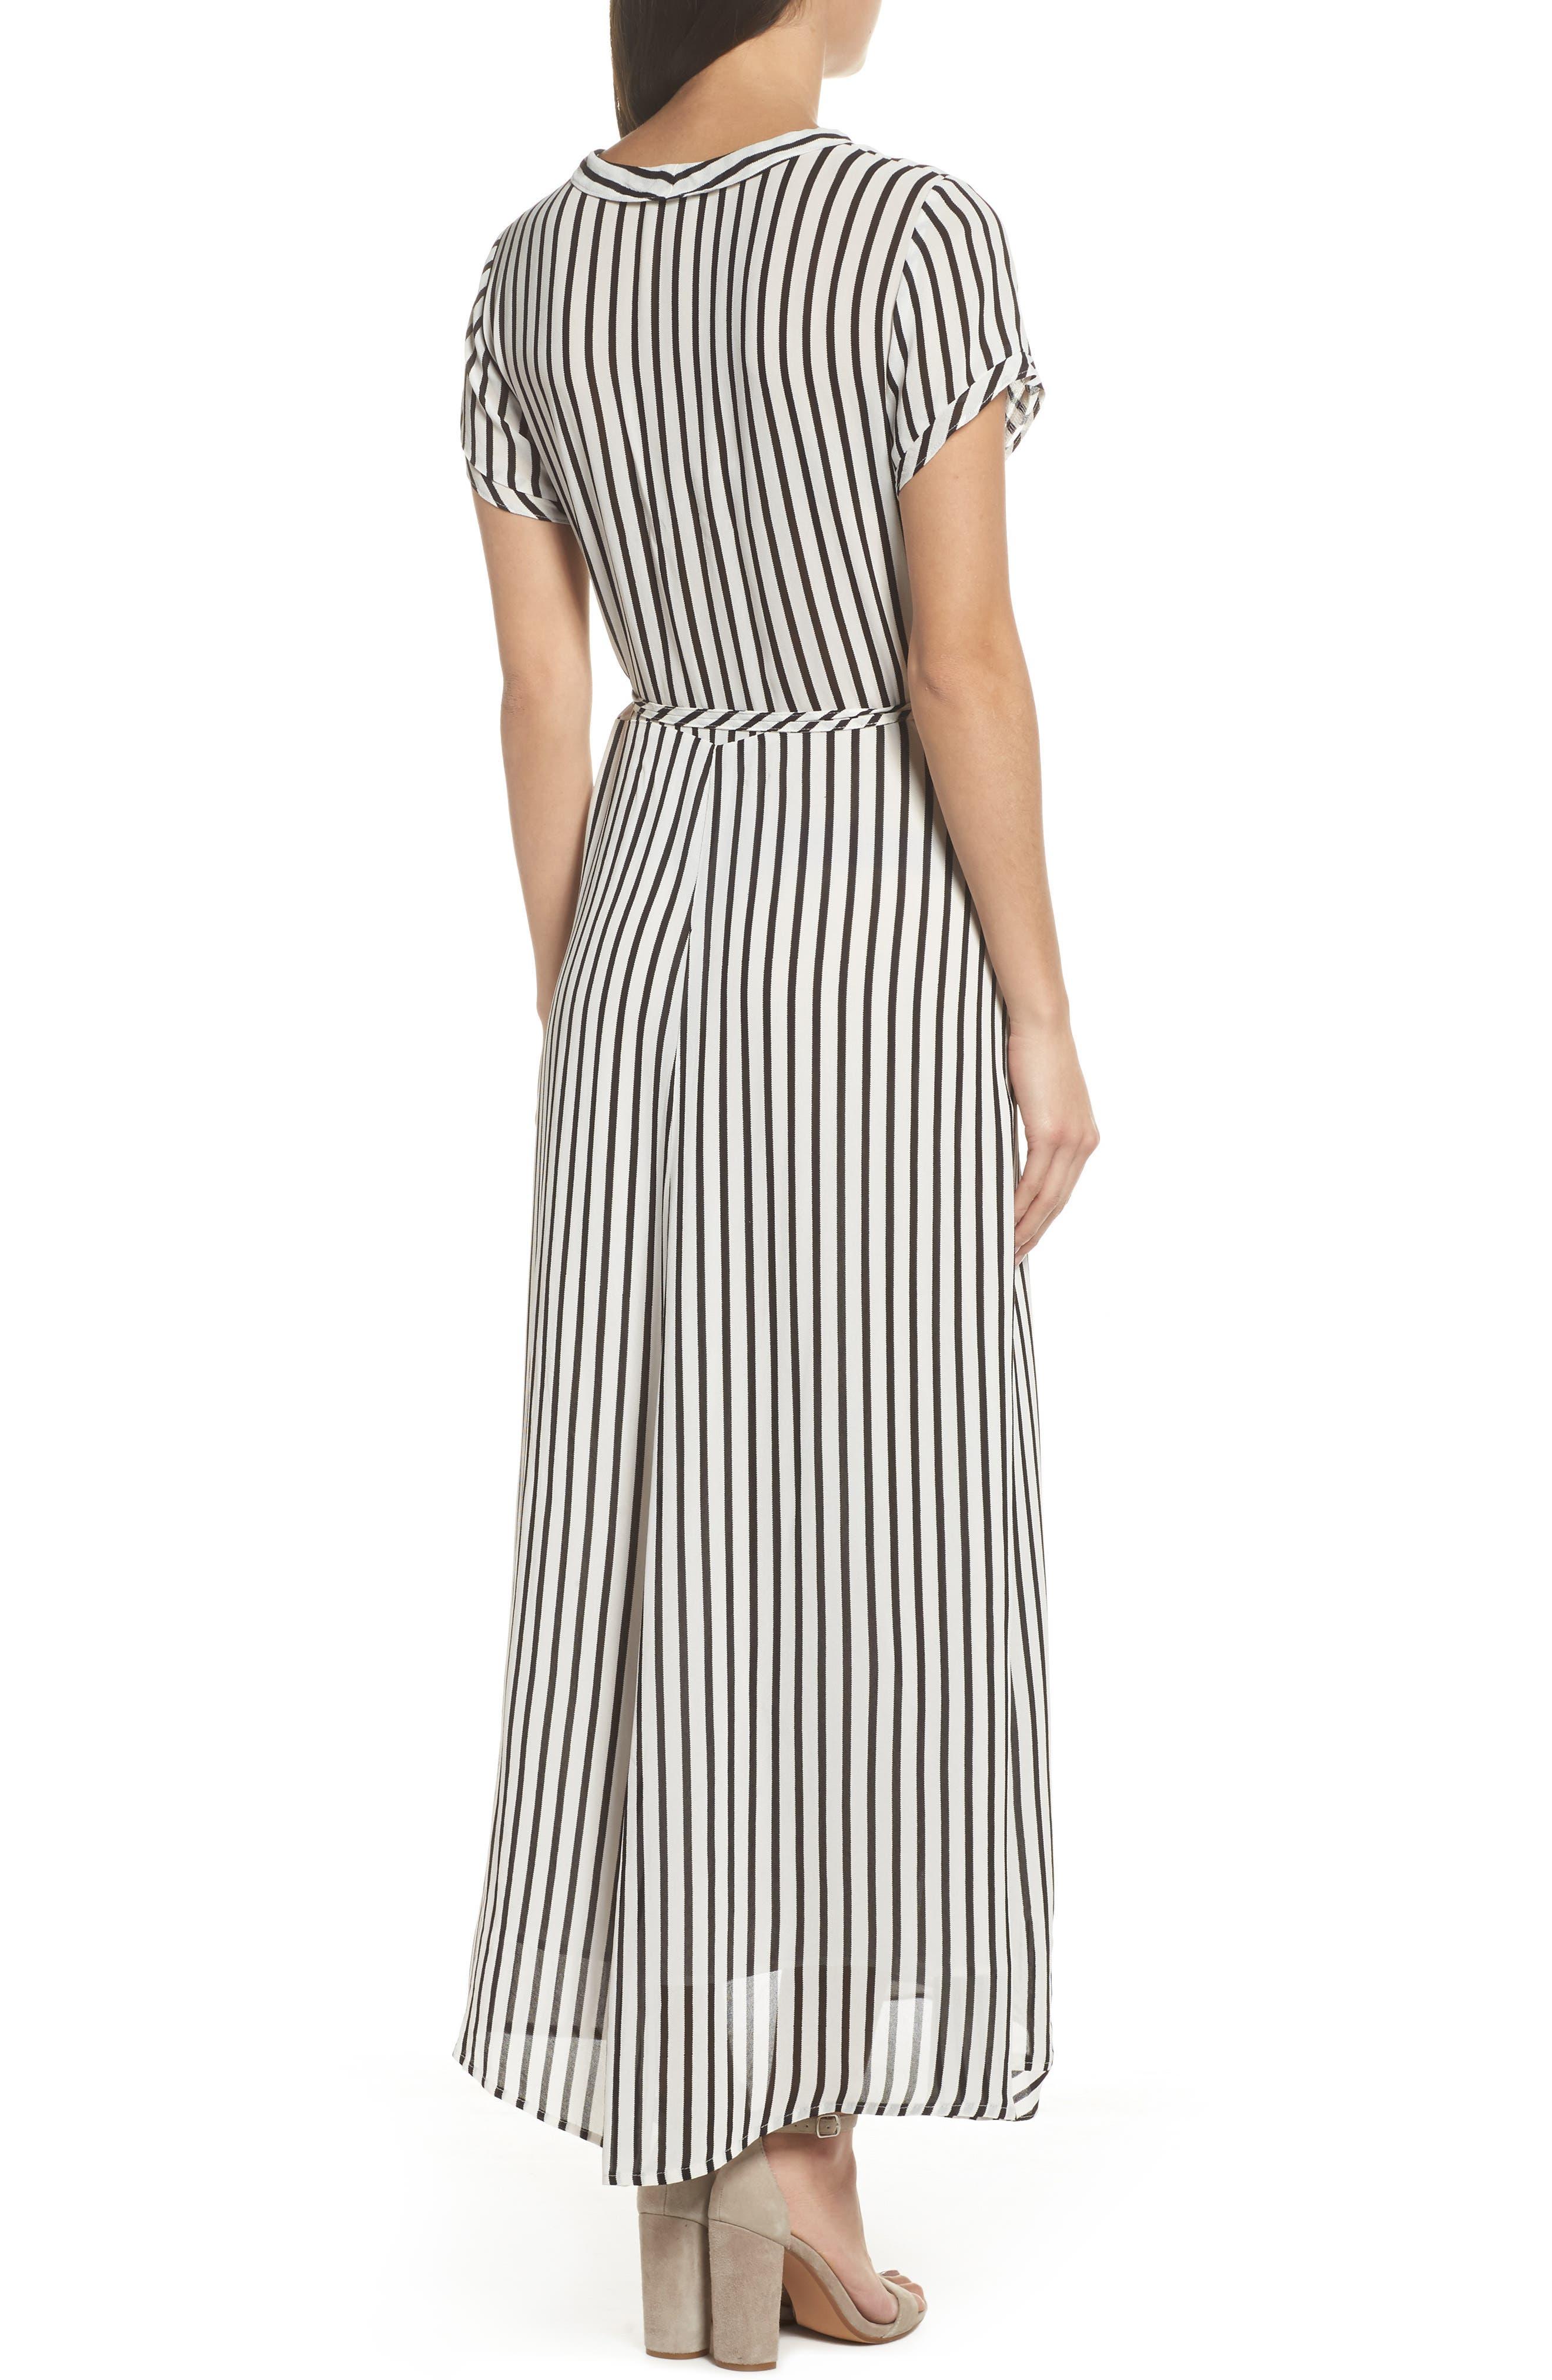 Adie Maxi Wrap Dress,                             Alternate thumbnail 2, color,                             013